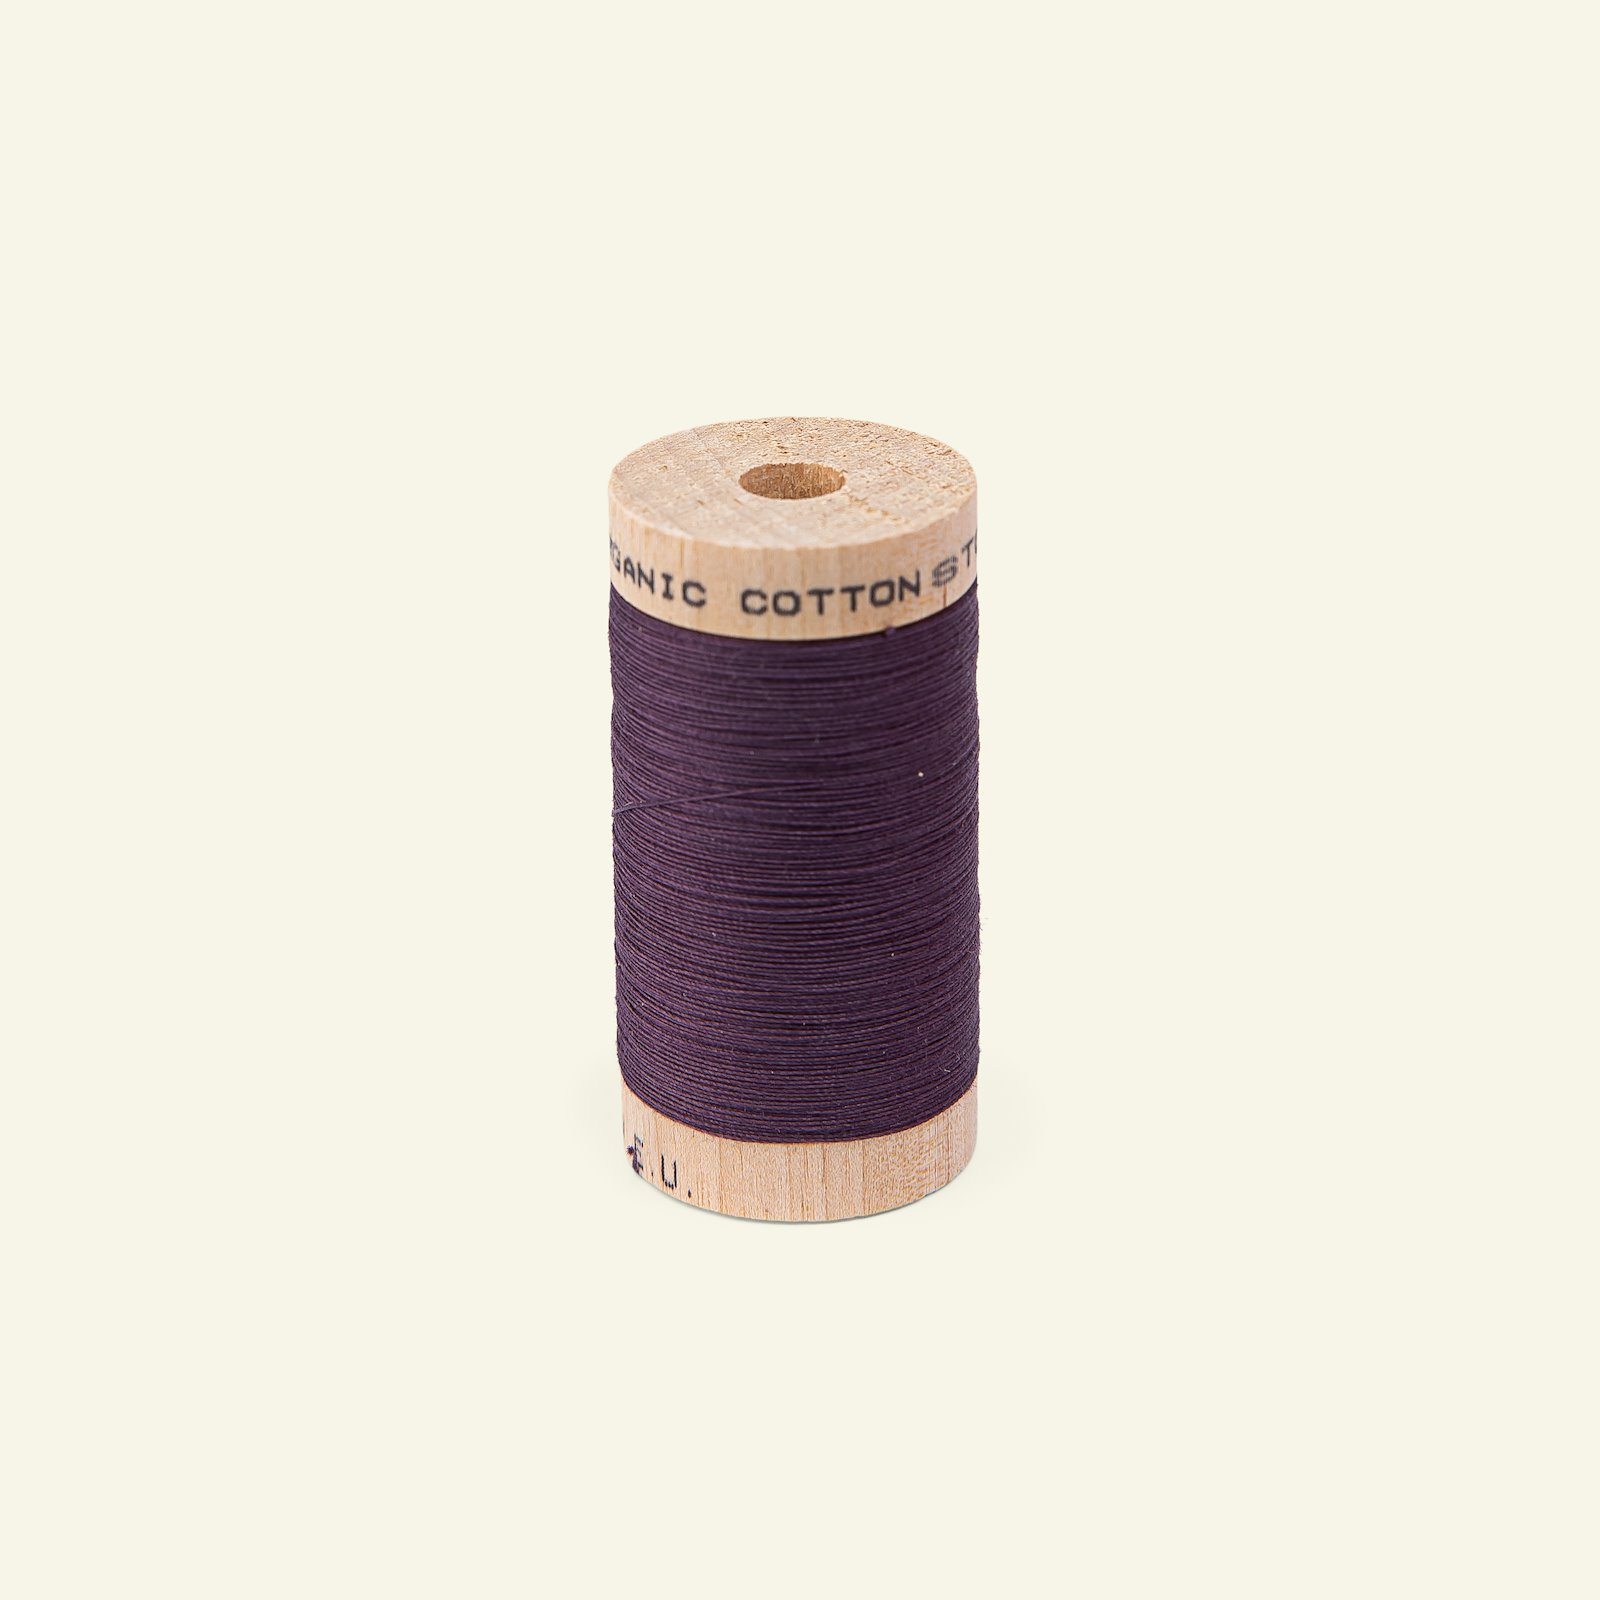 Sewingthread organic cotton dk plum 100m 18017_pack